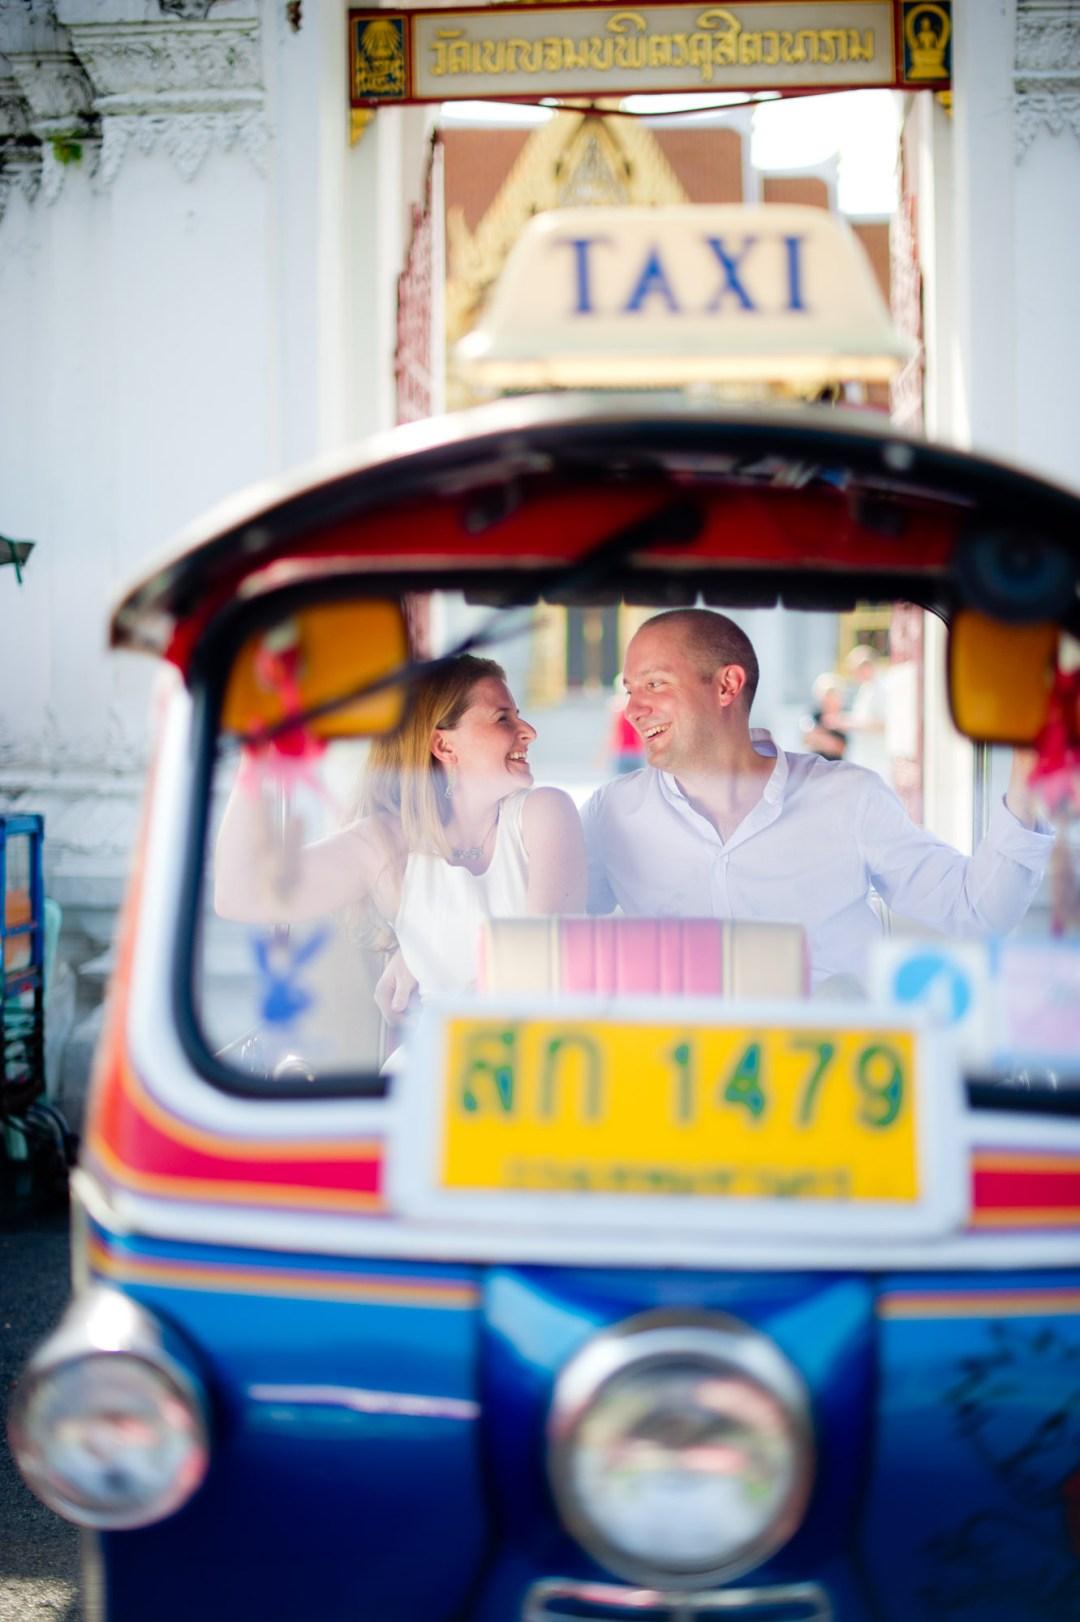 Engagement Session (Pre-Wedding) at Railway Park + Marble Temple + Rama VIII Suspension Bridge in Bangkok Thailand